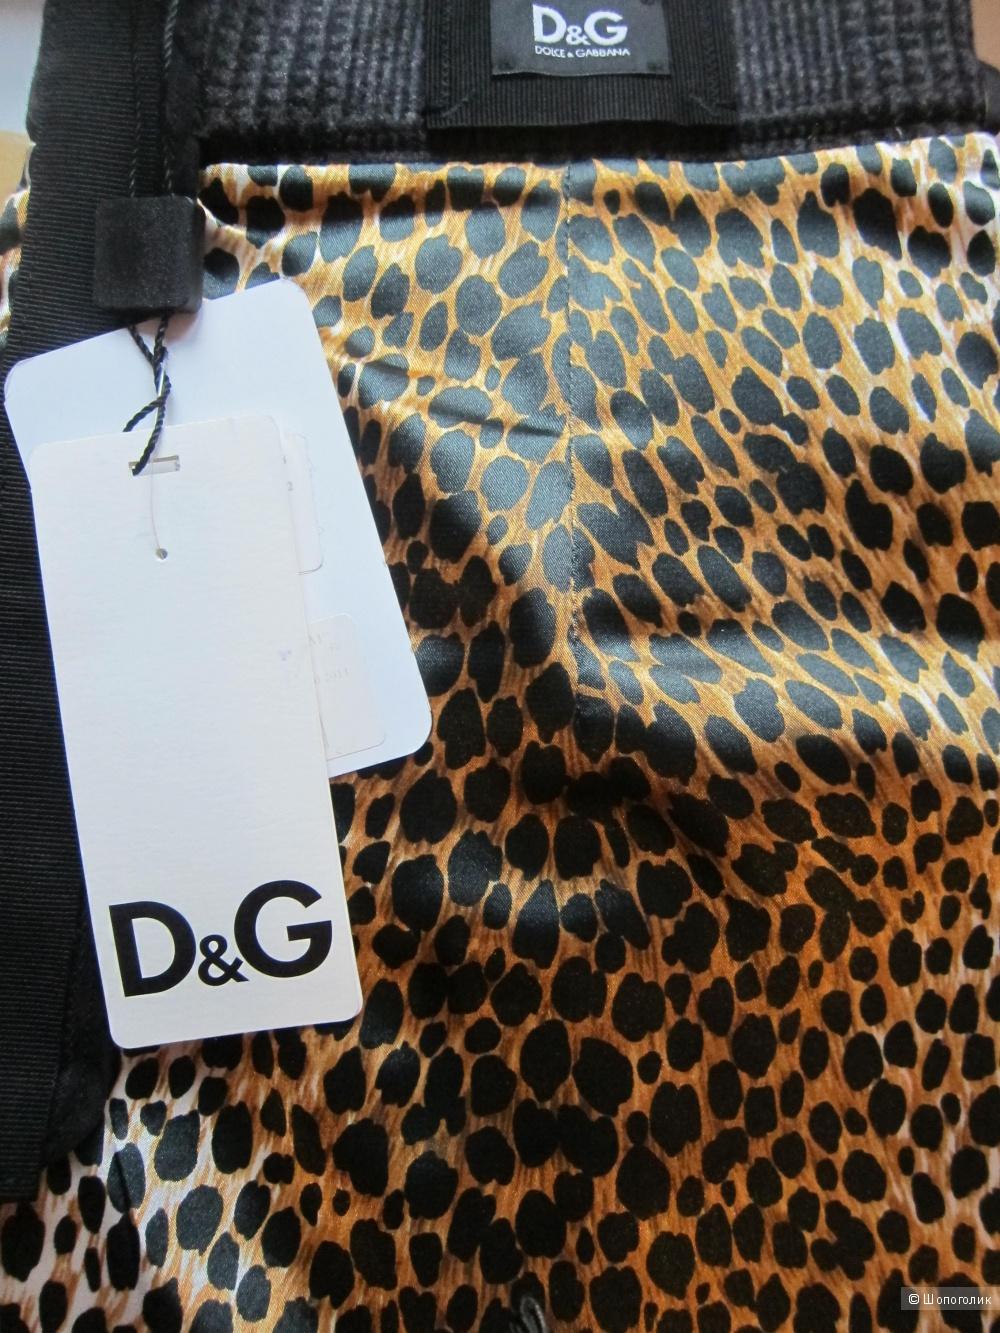 Юбка D&G (Dolce Gabbana) р. 38, XS-S, росс 42